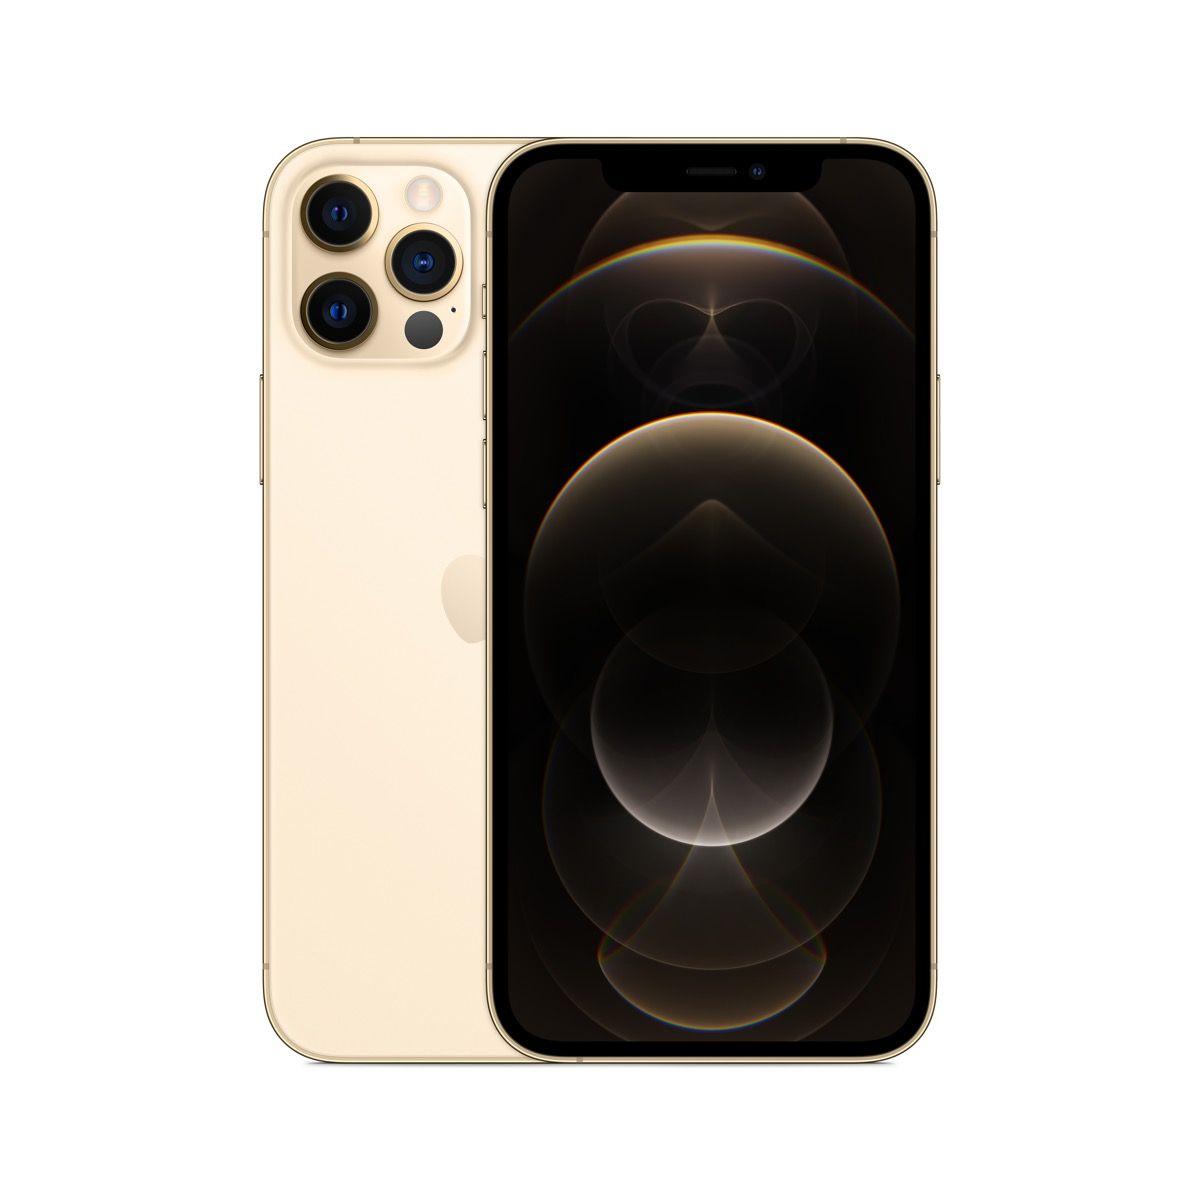 Apple iPhone 12 Pro Max 128GB Gold / SK